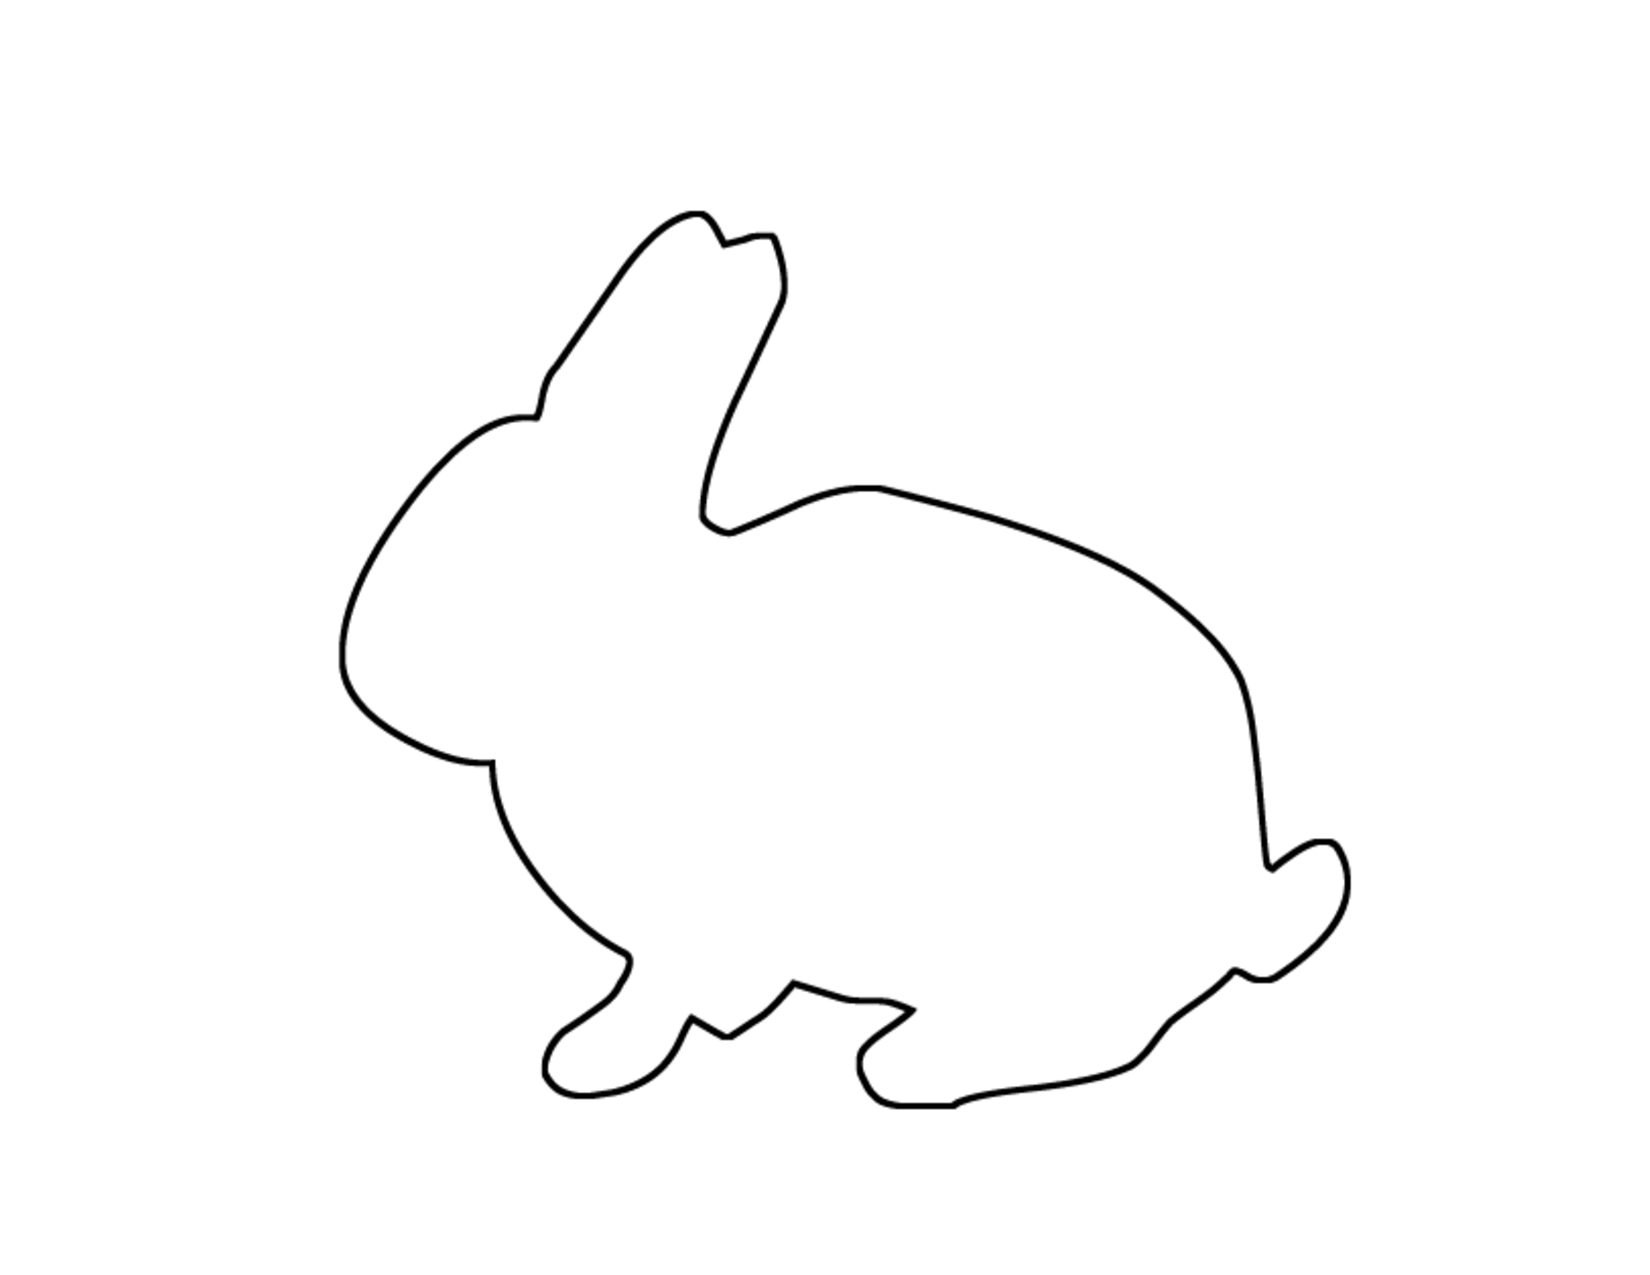 Bunny Outline Printable scope